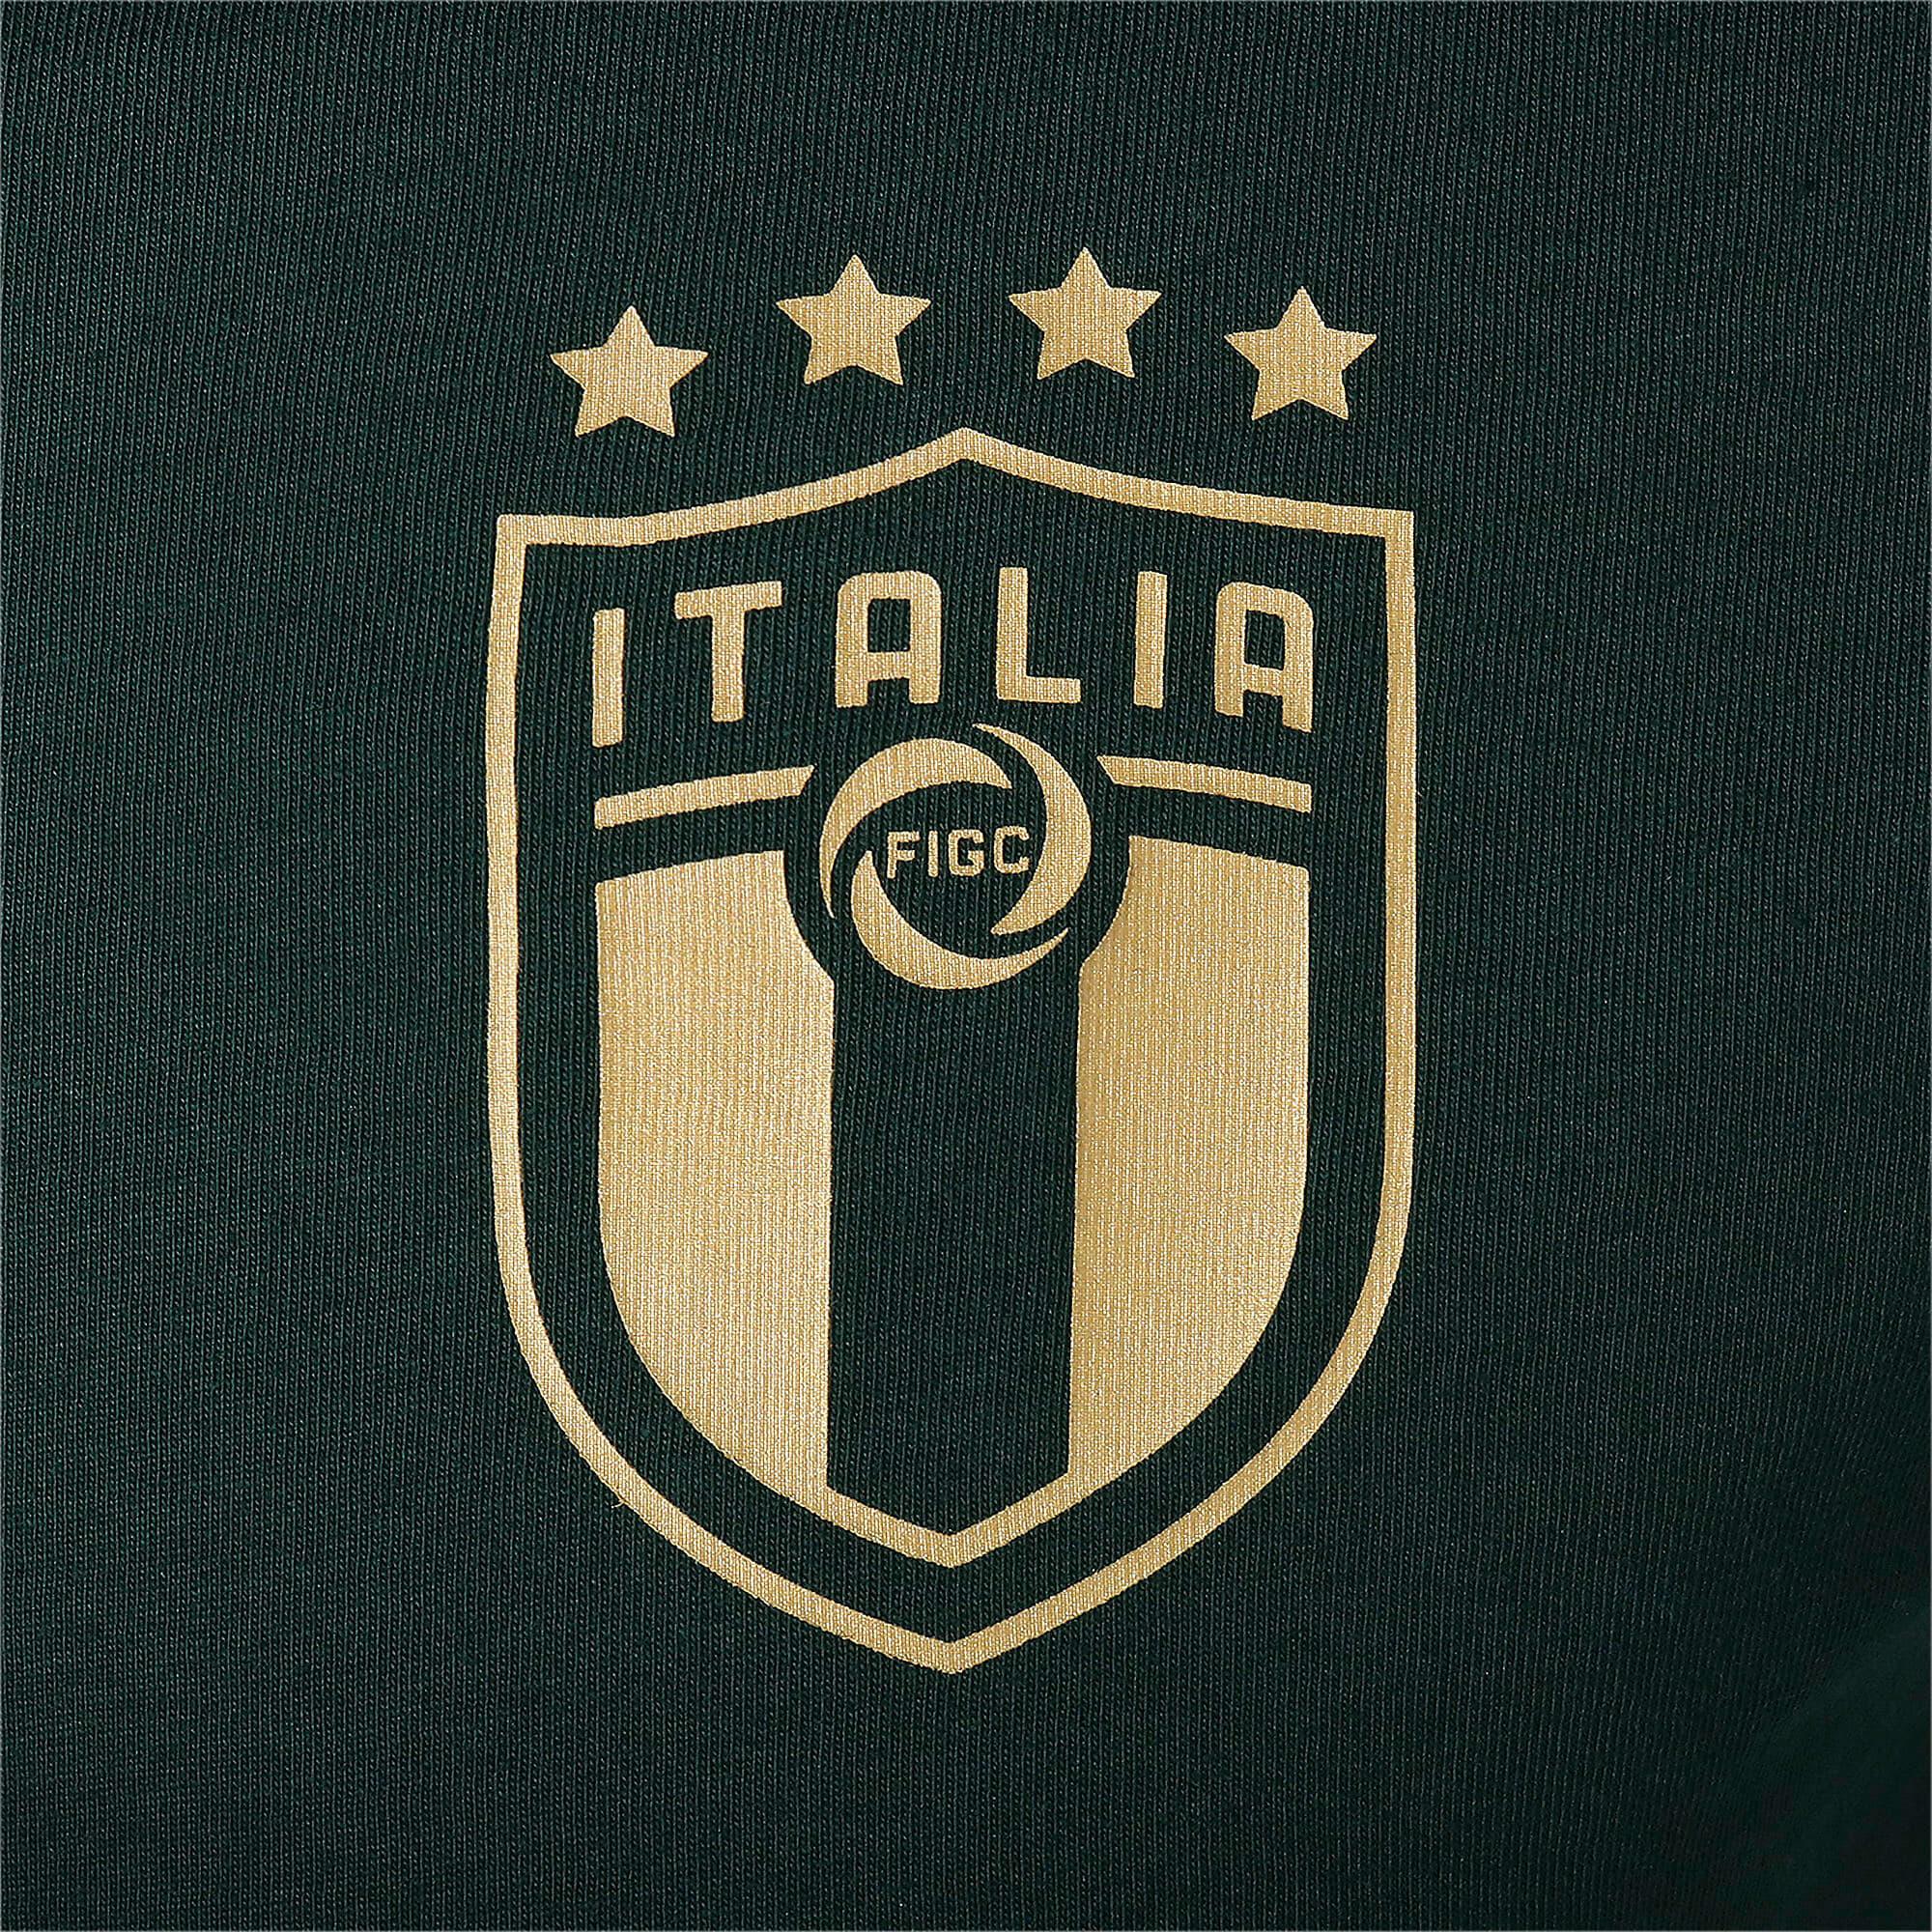 Thumbnail 7 of FIGC イタリア FTBL CULTURE Tシャツ 半袖, Ponderosa Pine, medium-JPN